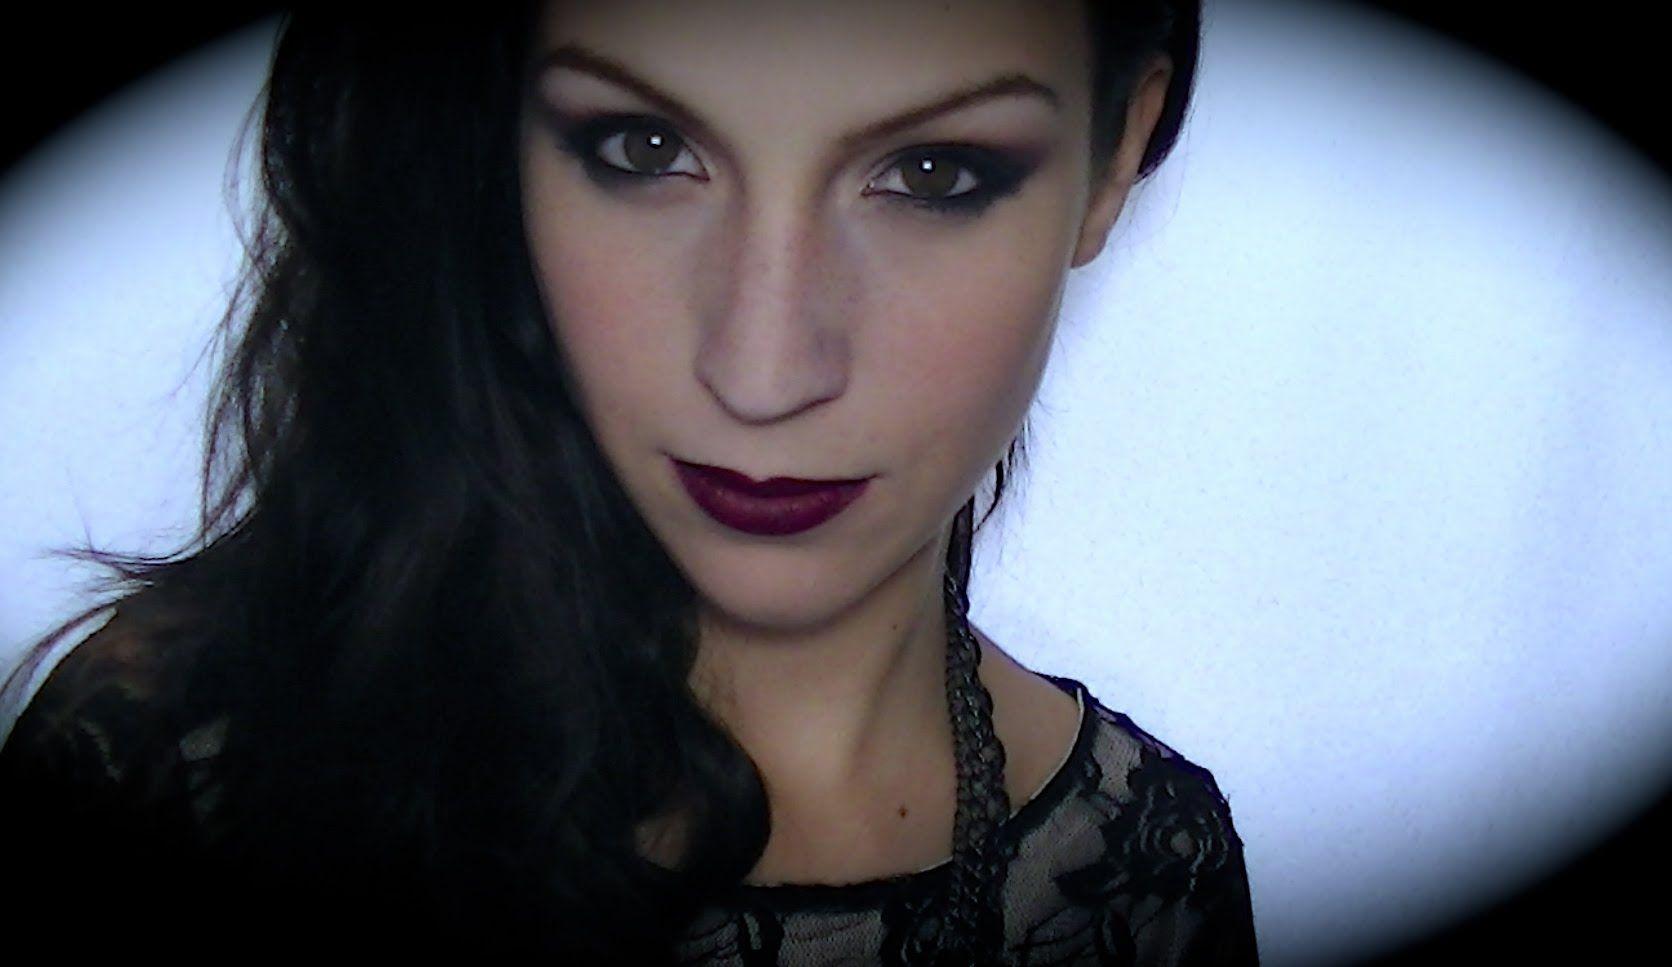 maquillage vampire elle